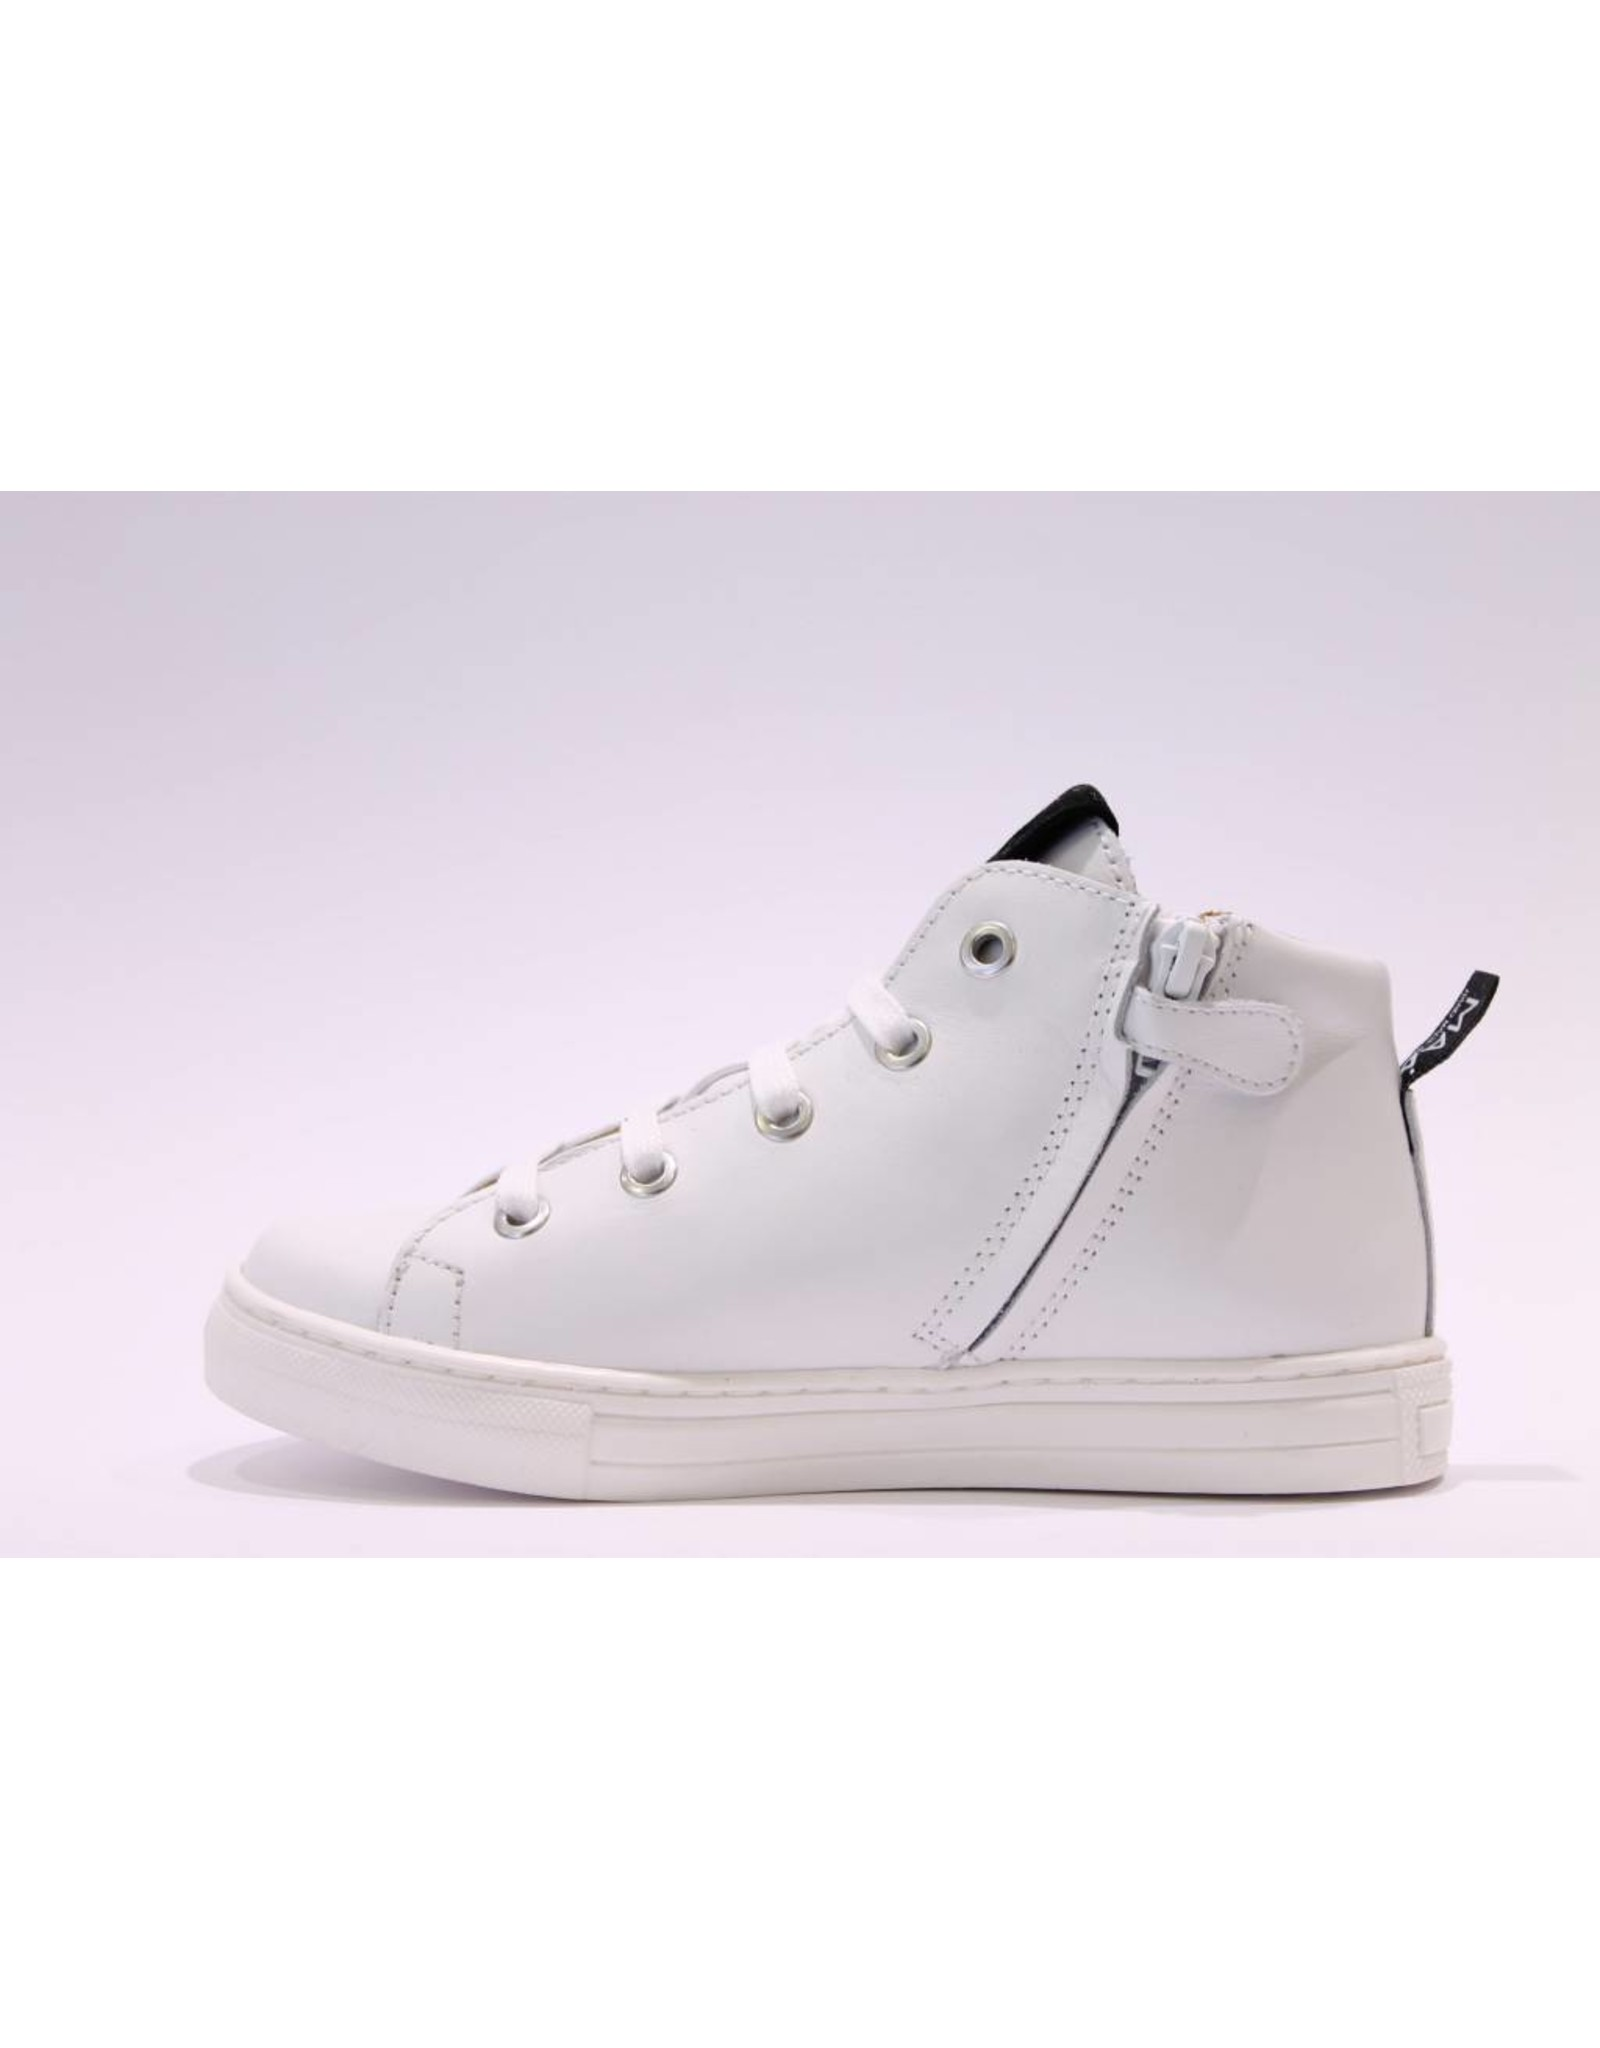 MAÁ sneaker hoog wit/zwart